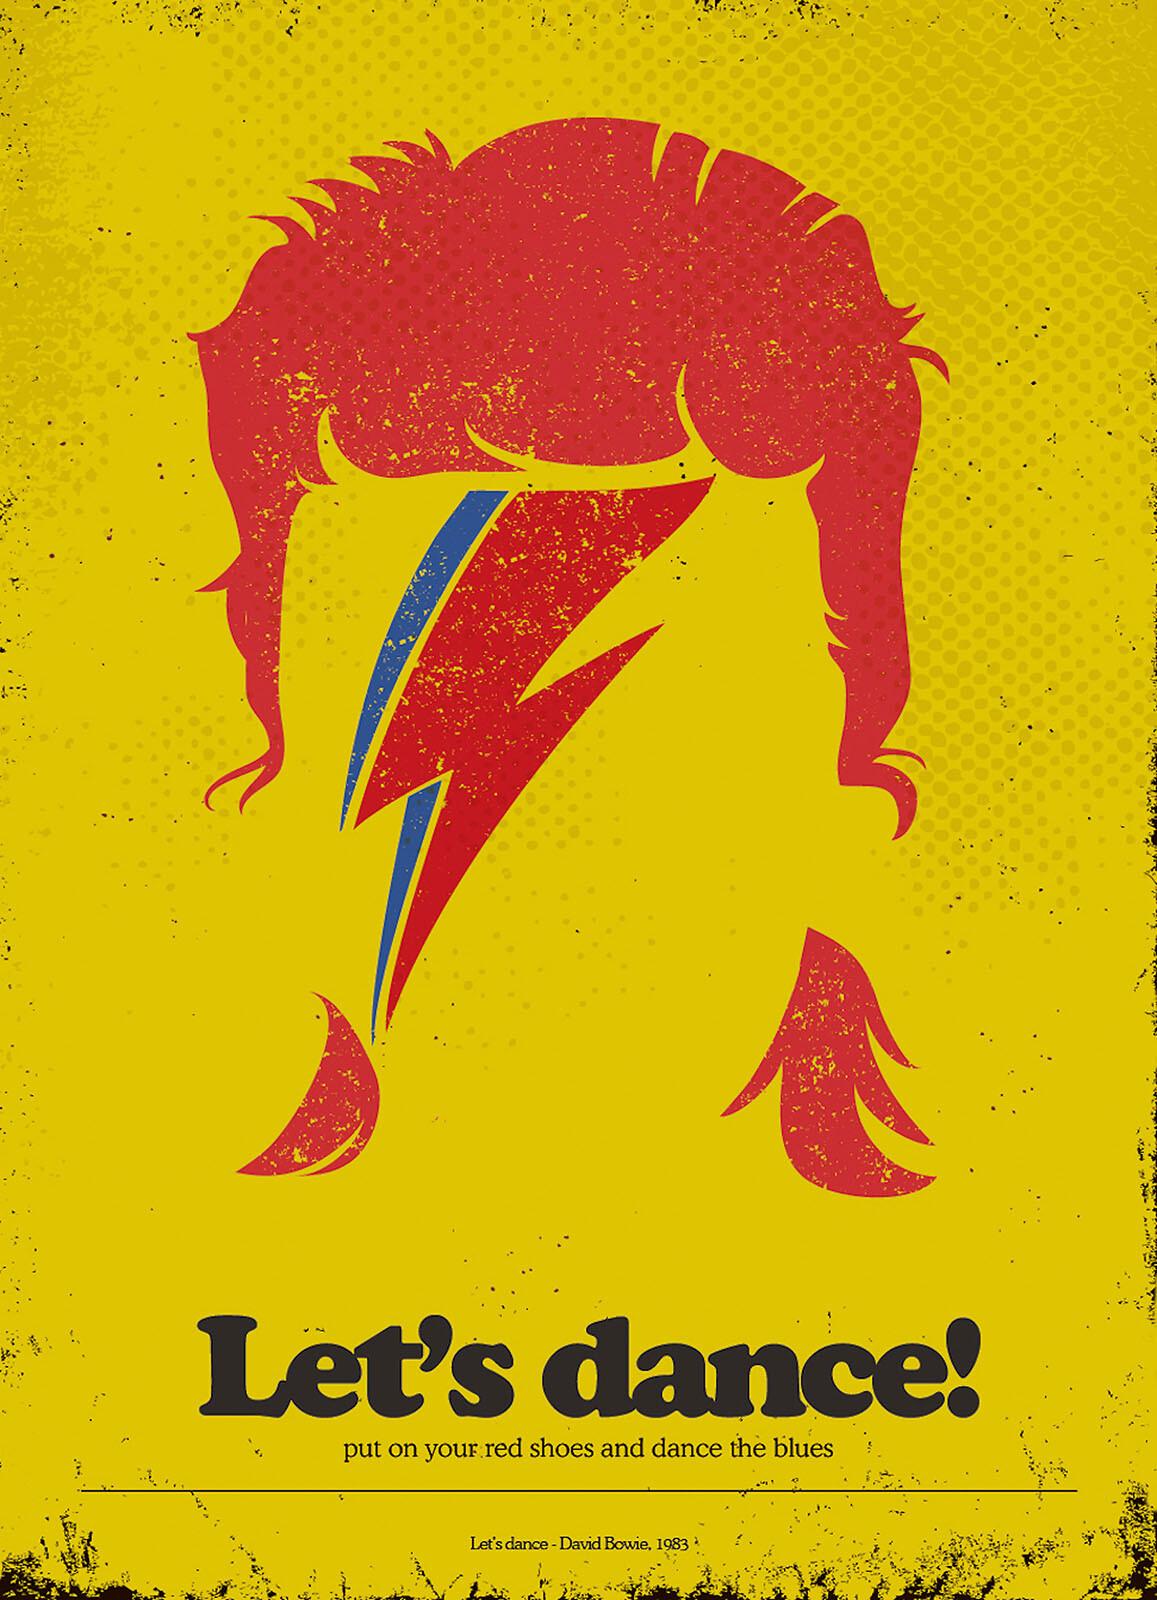 Let's dance - Rafael Barletta